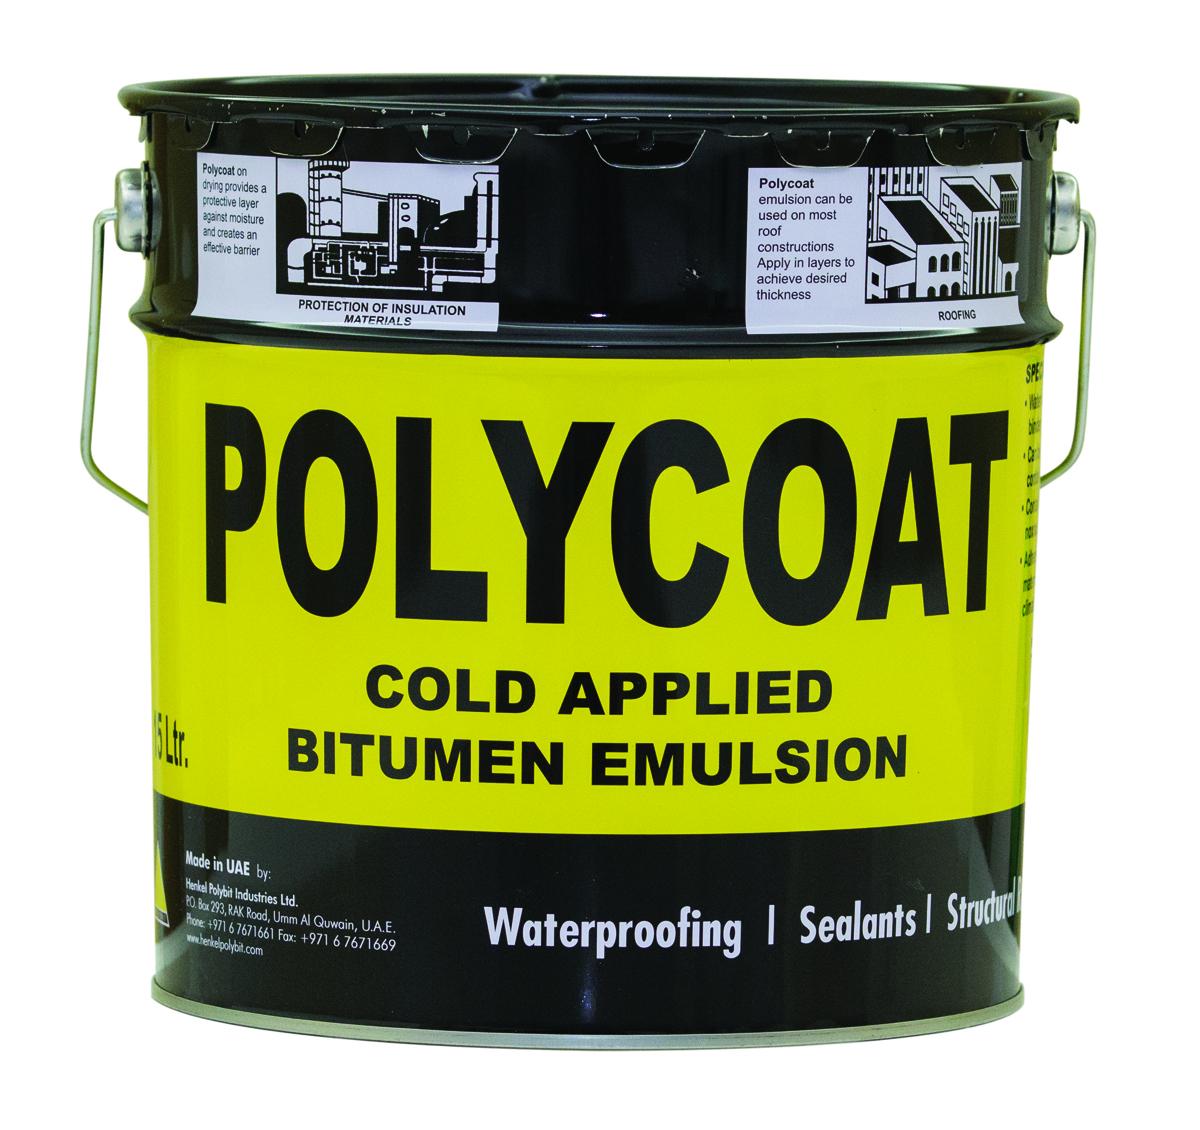 800benaa Polycoat Bitumen Emulsion 15 Ltr Polybit